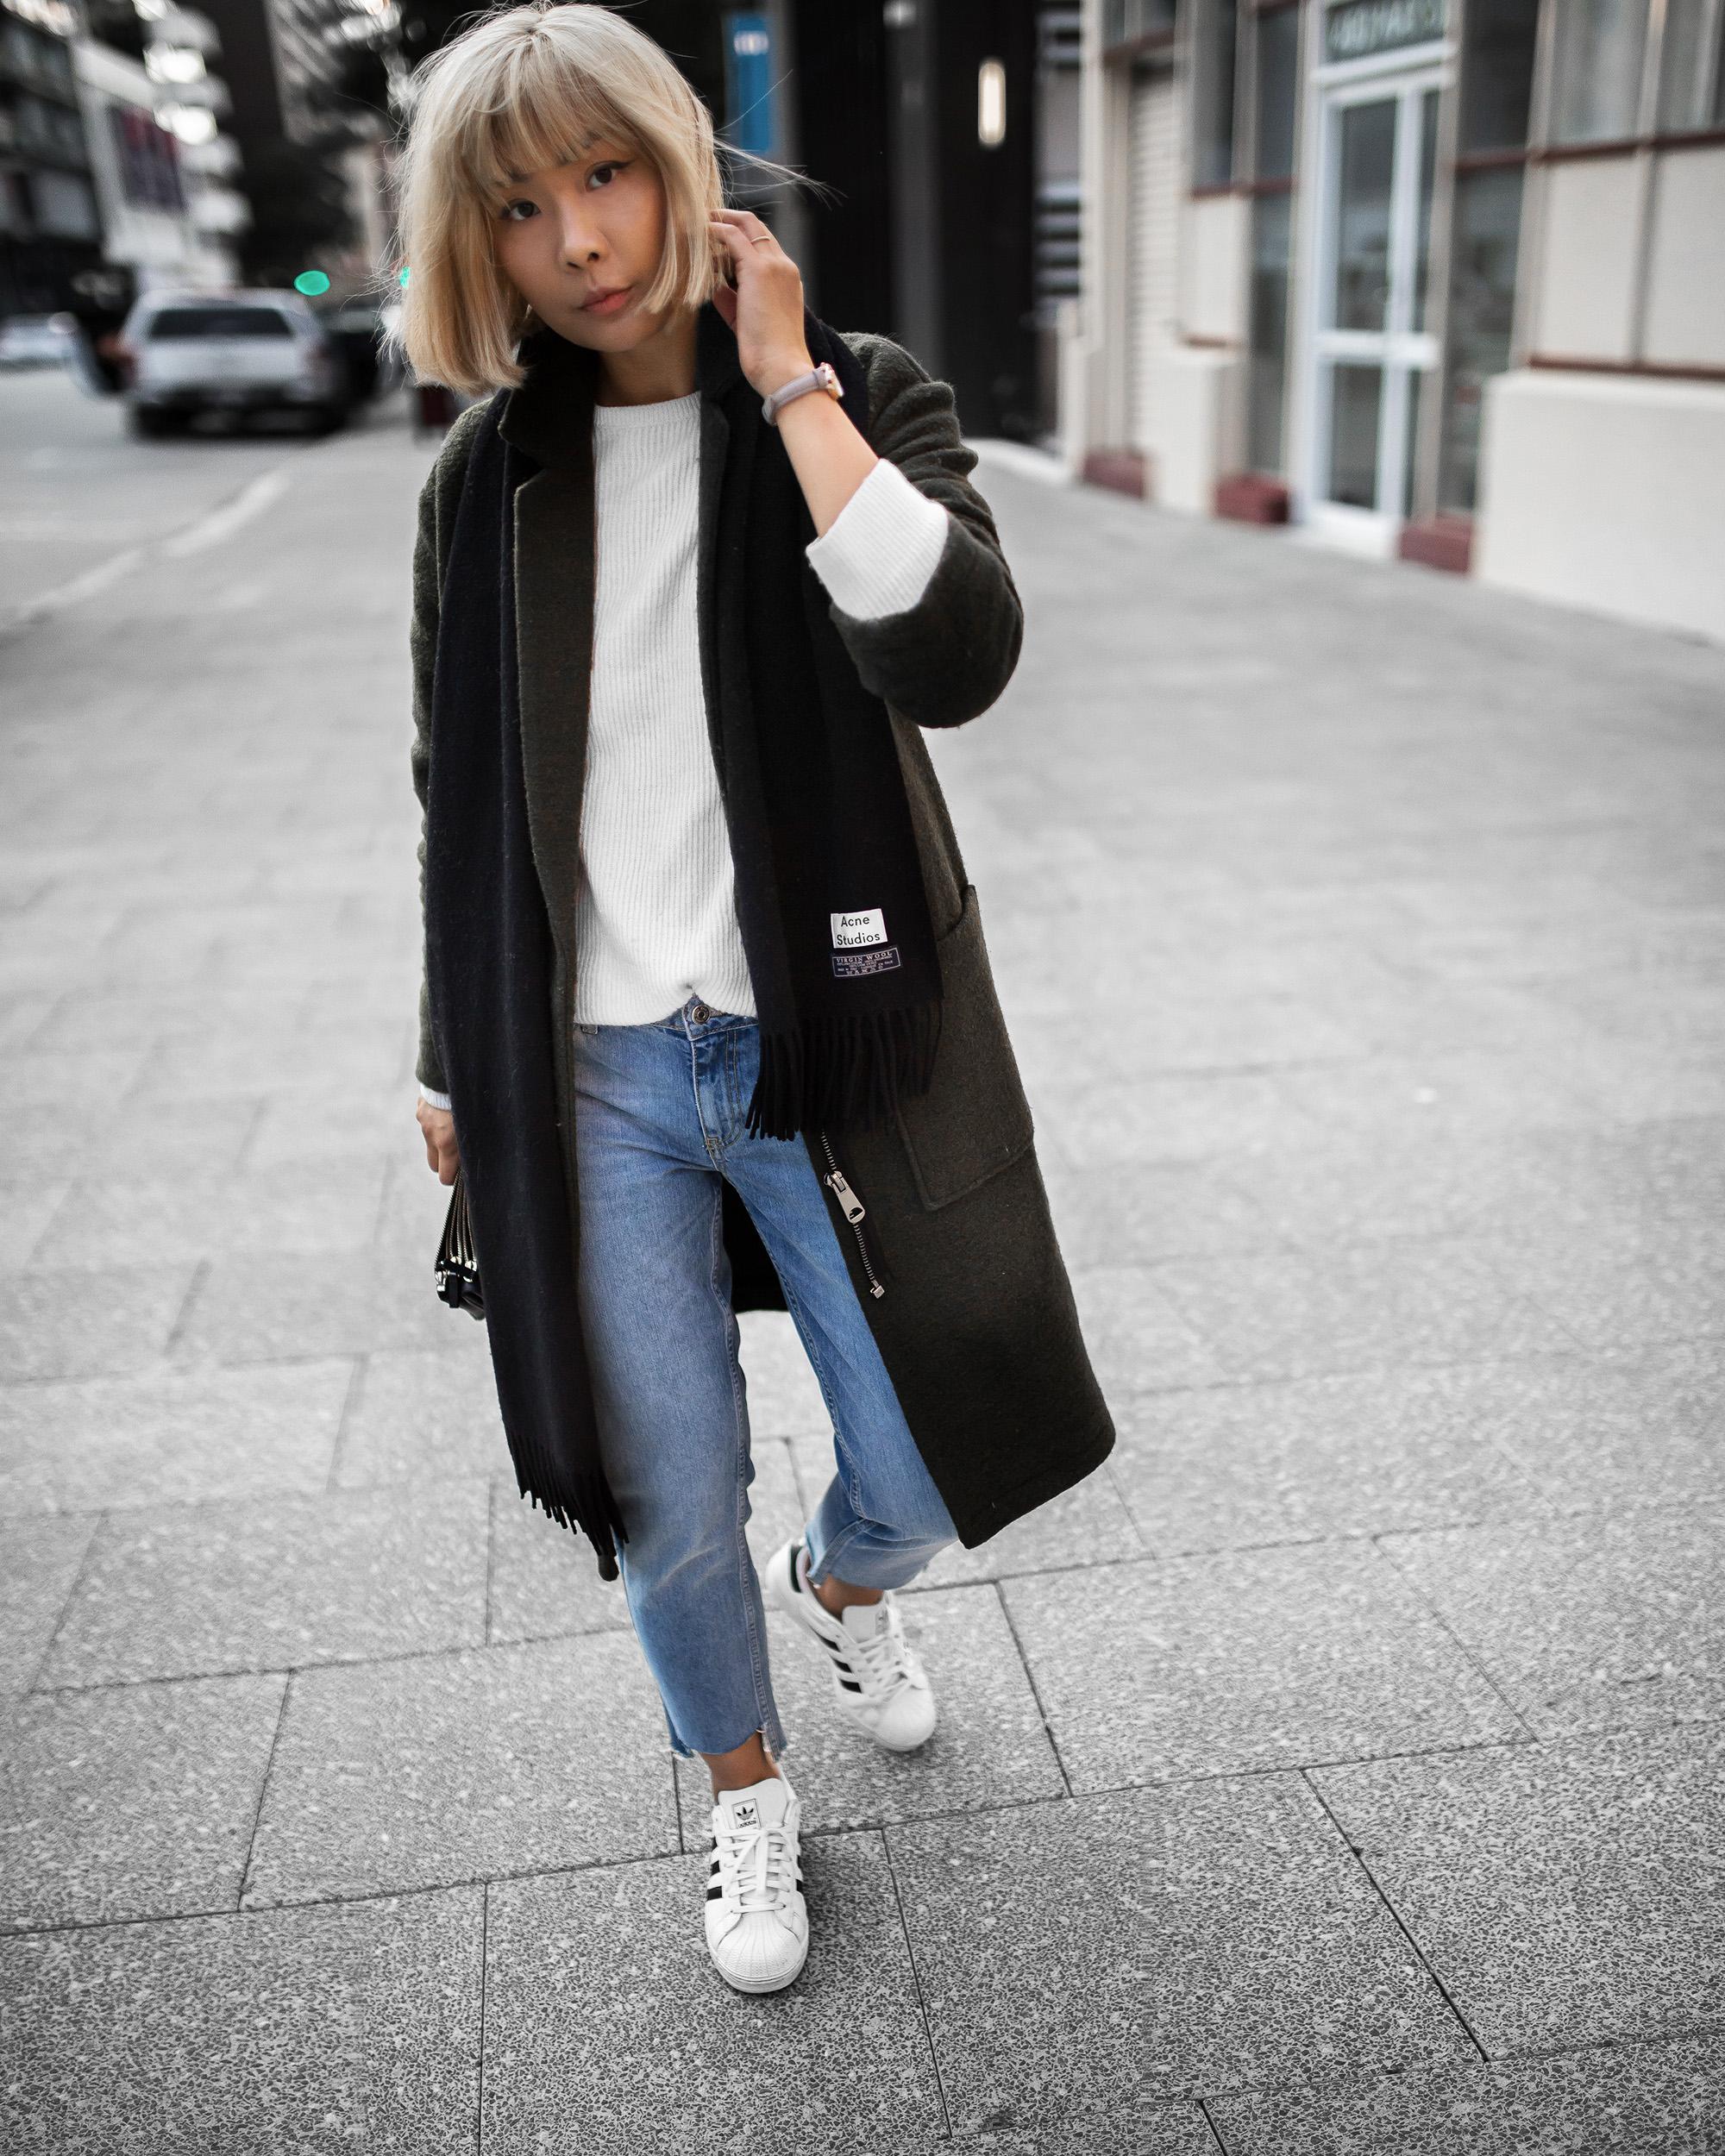 acne-scarf-khaki-coat-stepped-hem-jeans-outfit-inspiration-1-2-copy